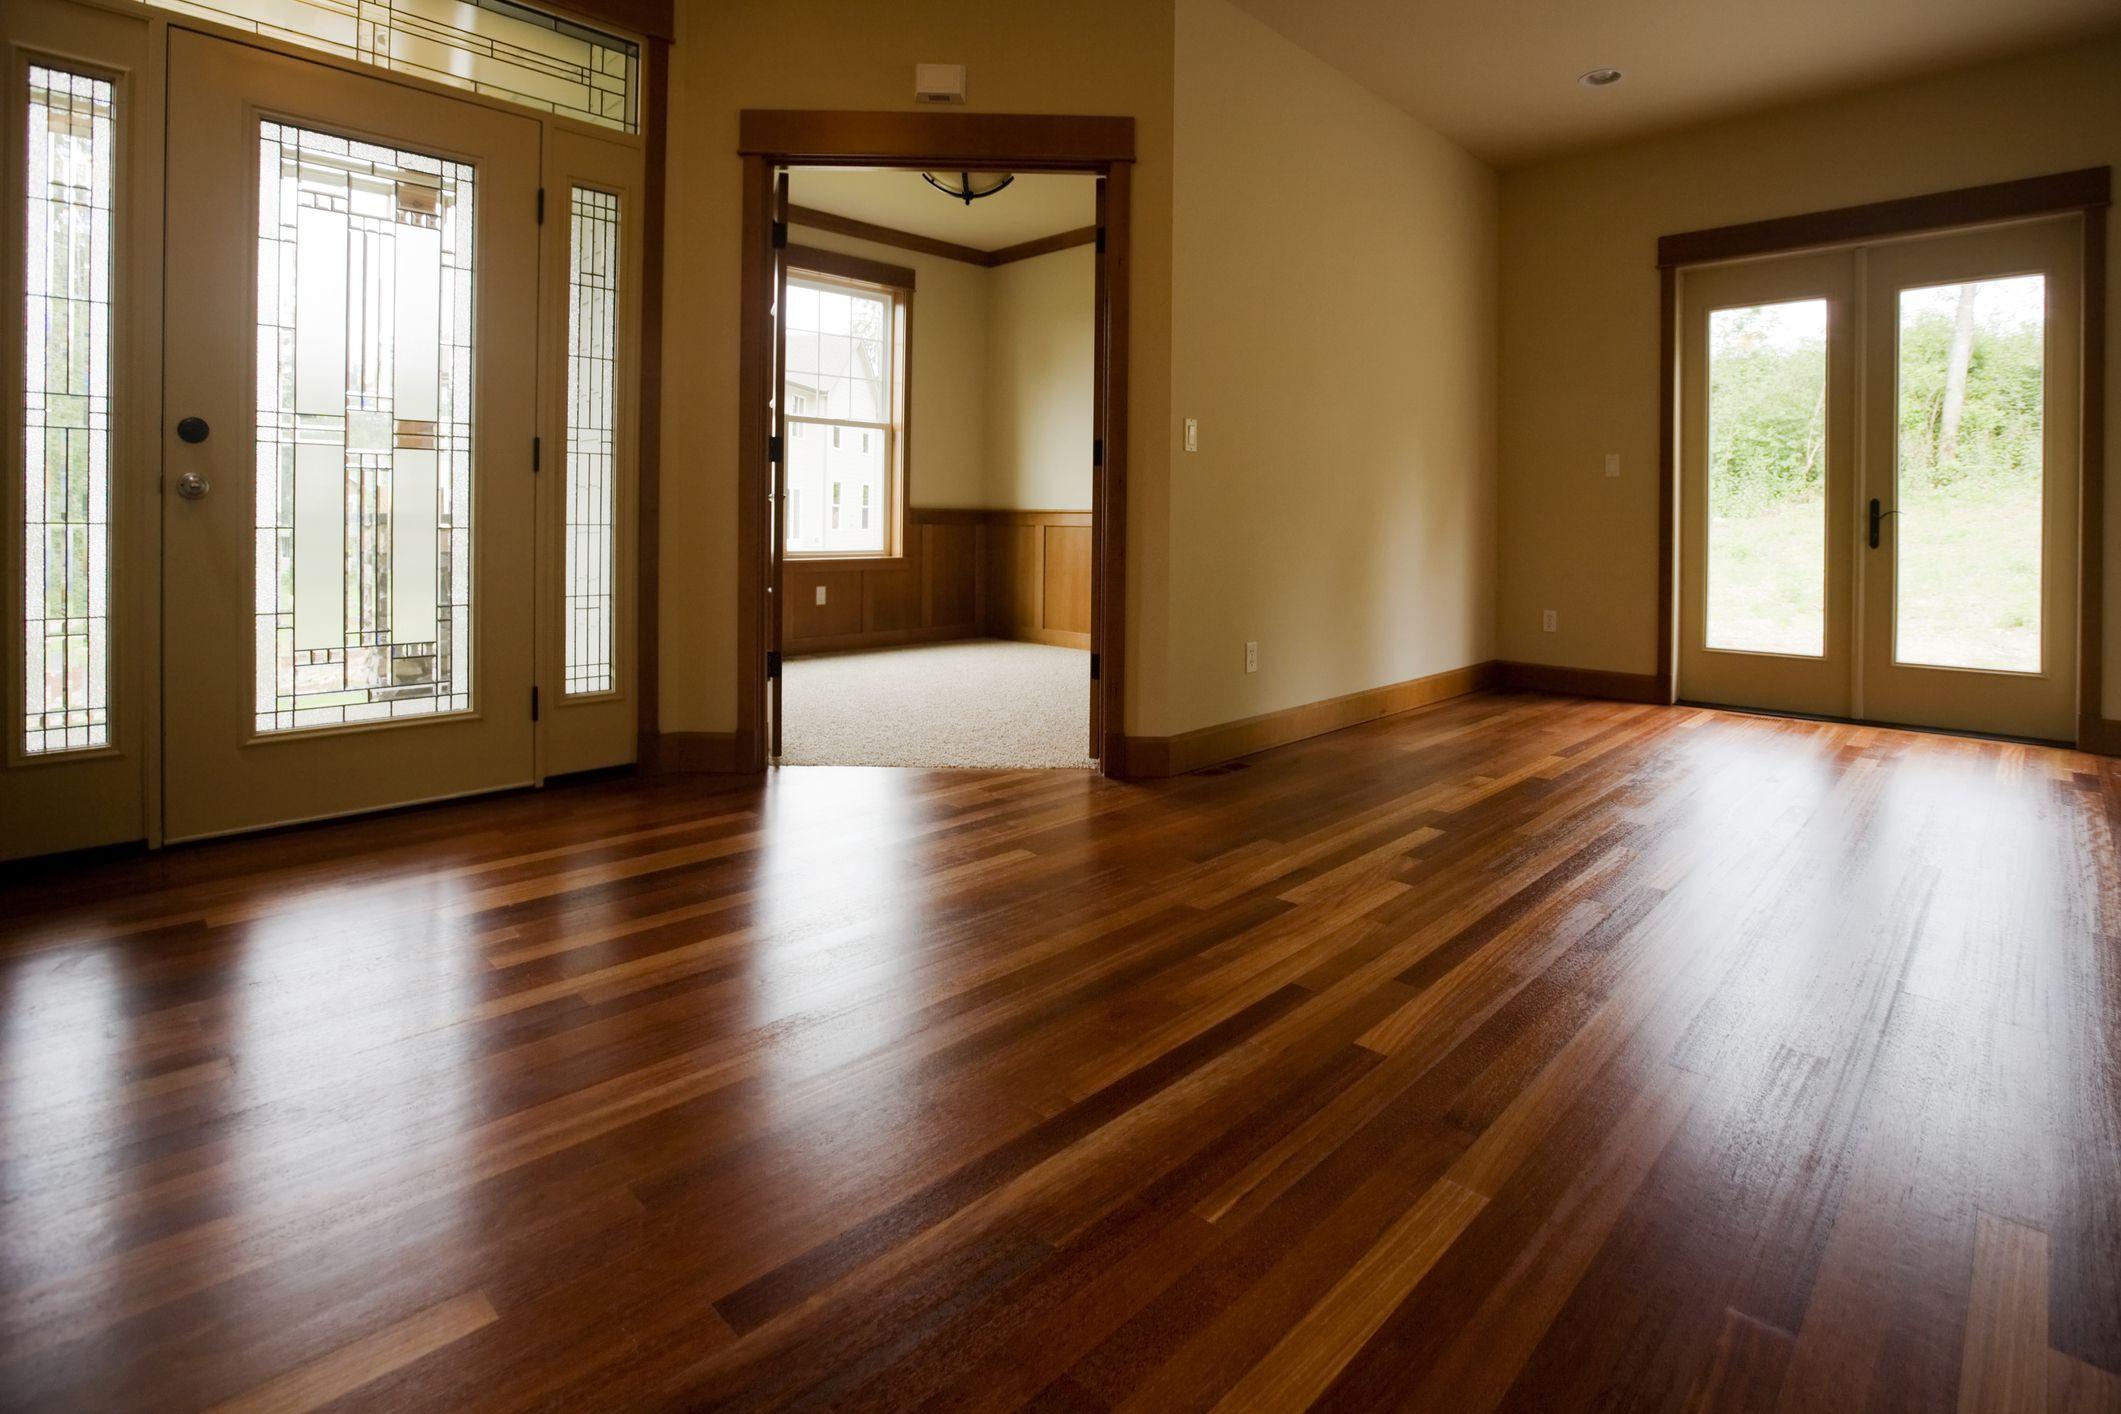 dark walnut hardwood floors of types of hardwood flooring buyers guide in gettyimages 157332889 5886d8383df78c2ccd65d4e1